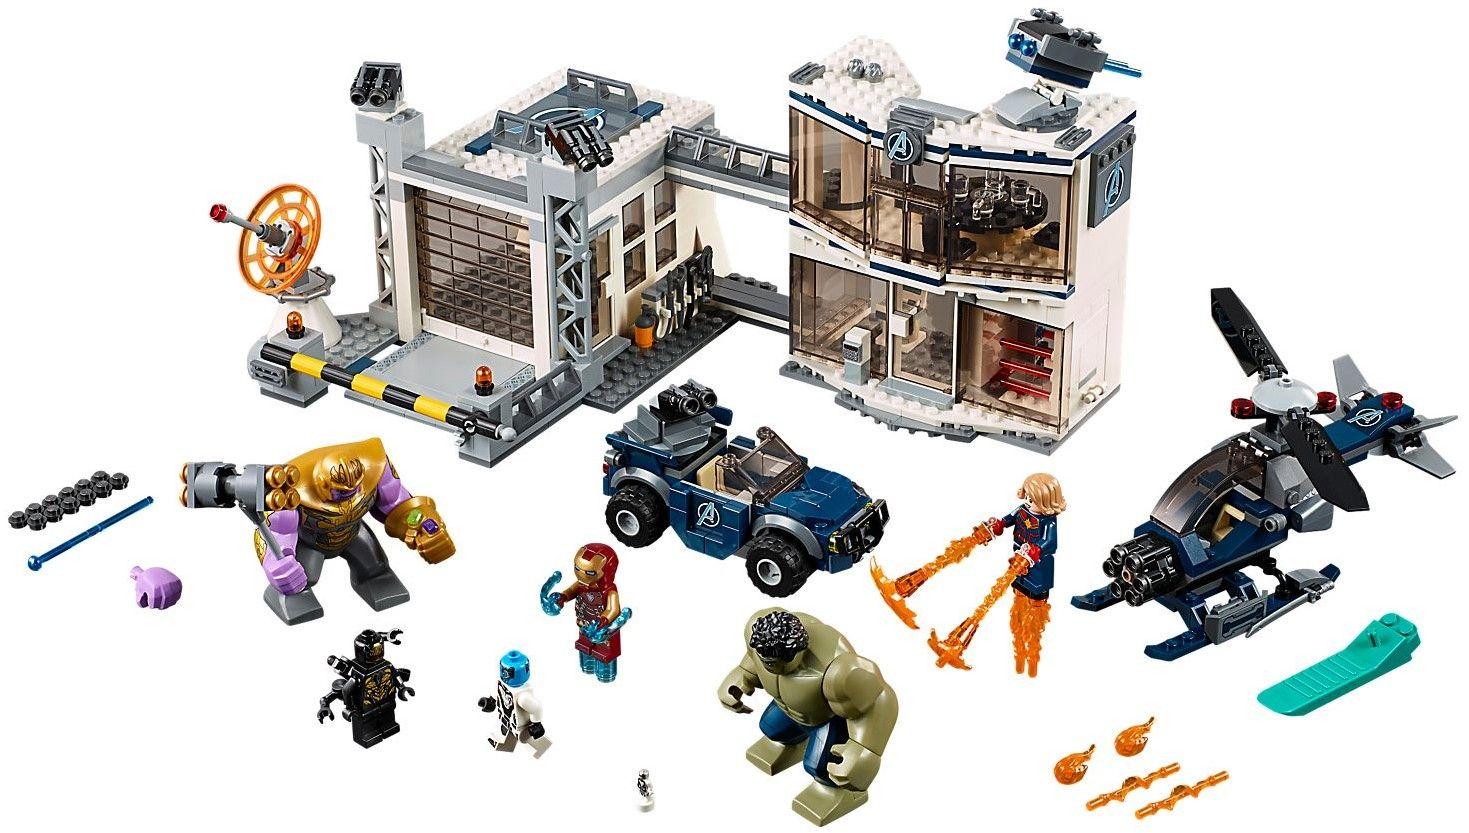 Конструктор Lego Marvel Super Heroes - Avengers Compound Battle (76131) - 4